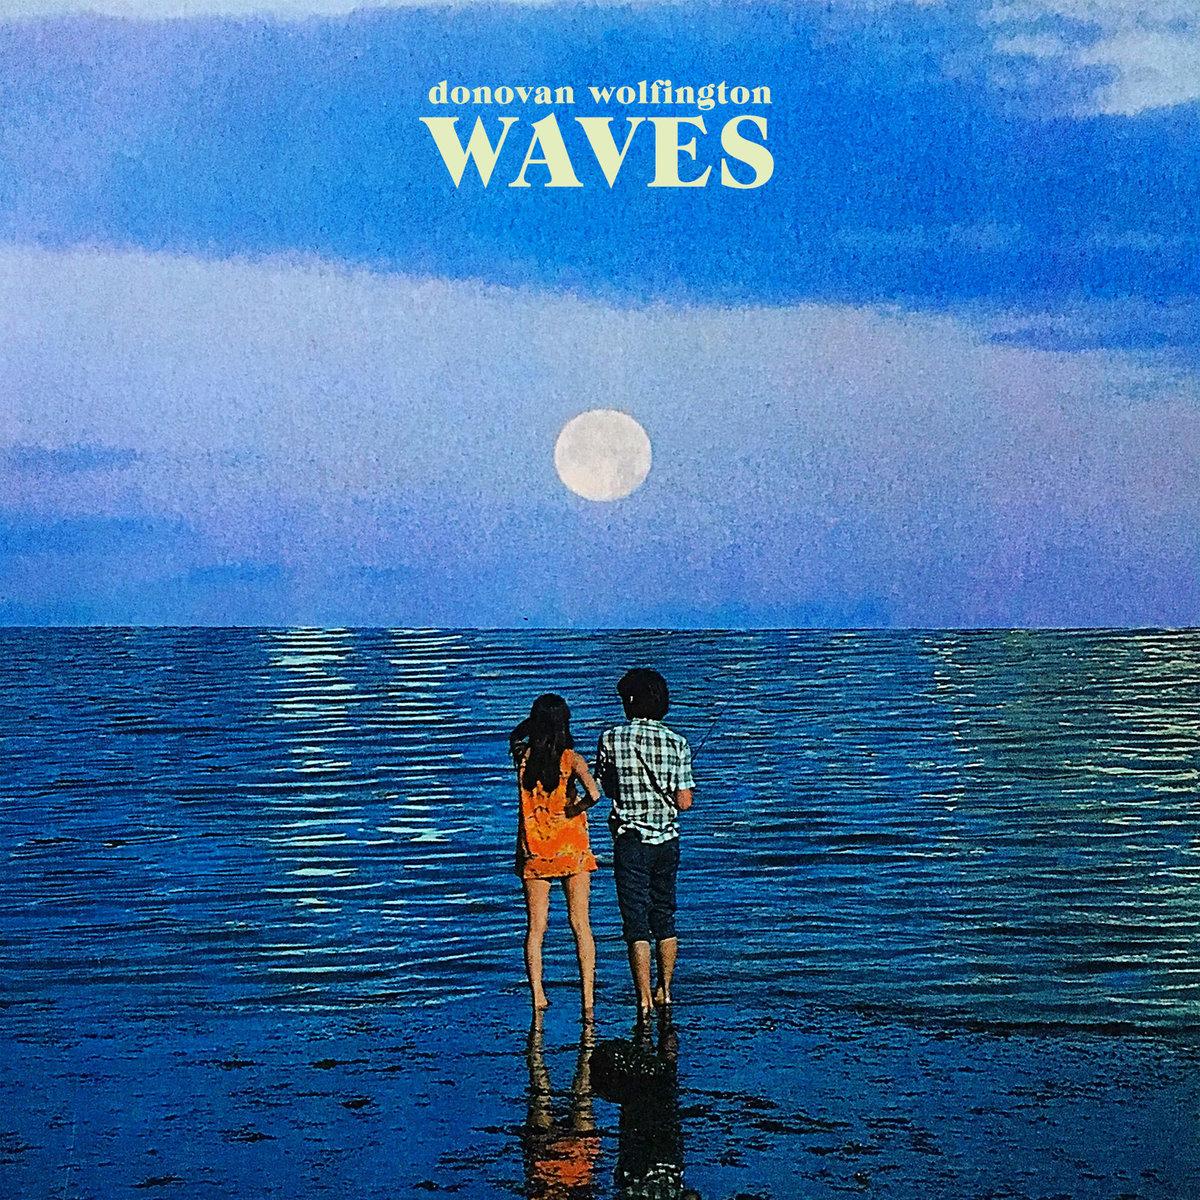 Donovan Wolfington - Waves LP